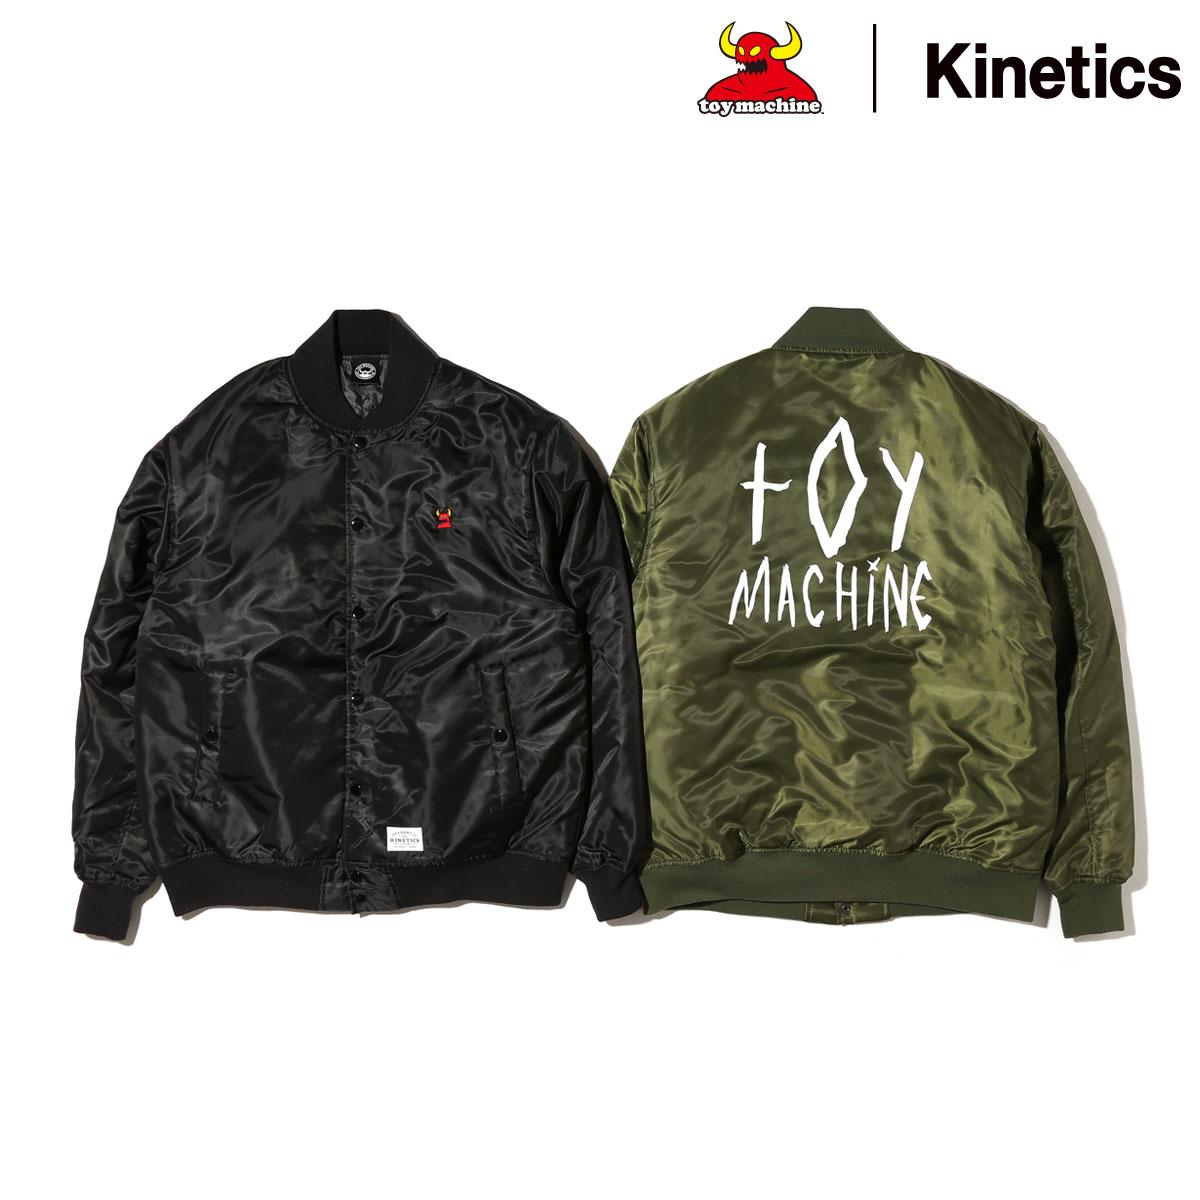 TOY MACHINE × Kinetics MONSTER Stadium Jacket (2色展開) (トイマシーン キネティクス モンスター スタジャン) 【メンズサイズ】【16HO-I】